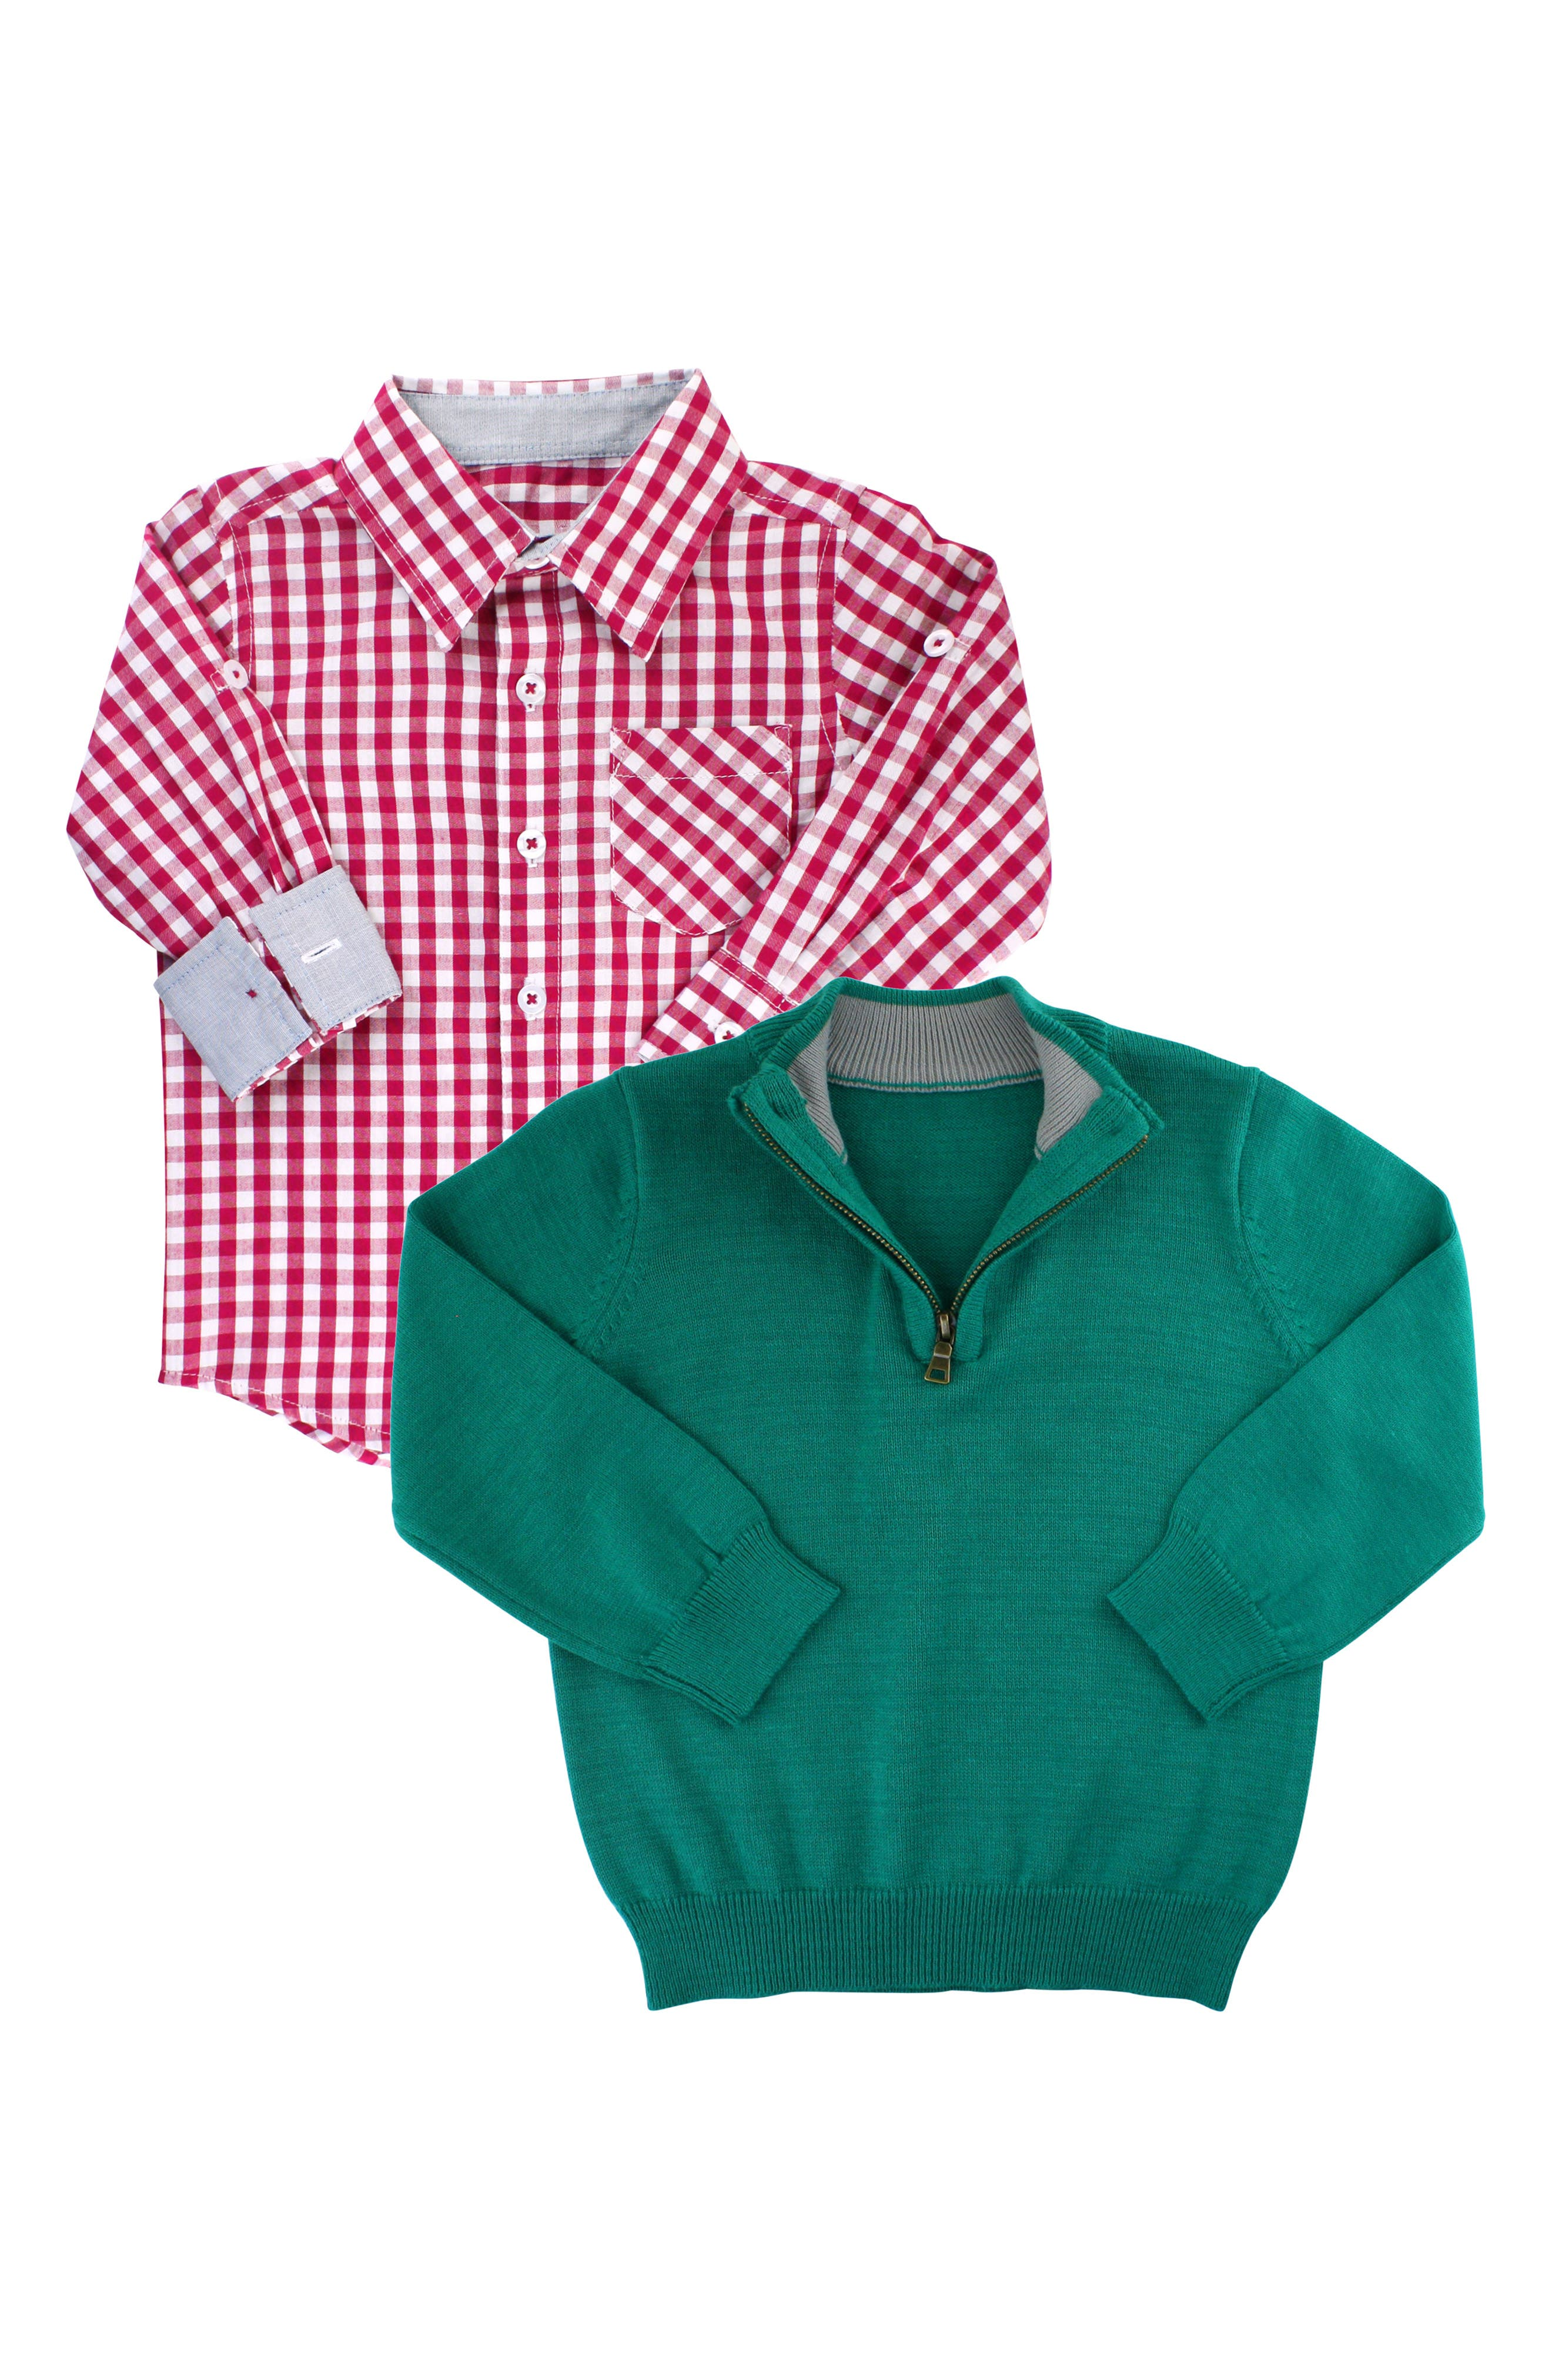 RUGGEDBUTTS, Gingham Shirt & Pullover Sweater Set, Main thumbnail 1, color, 300